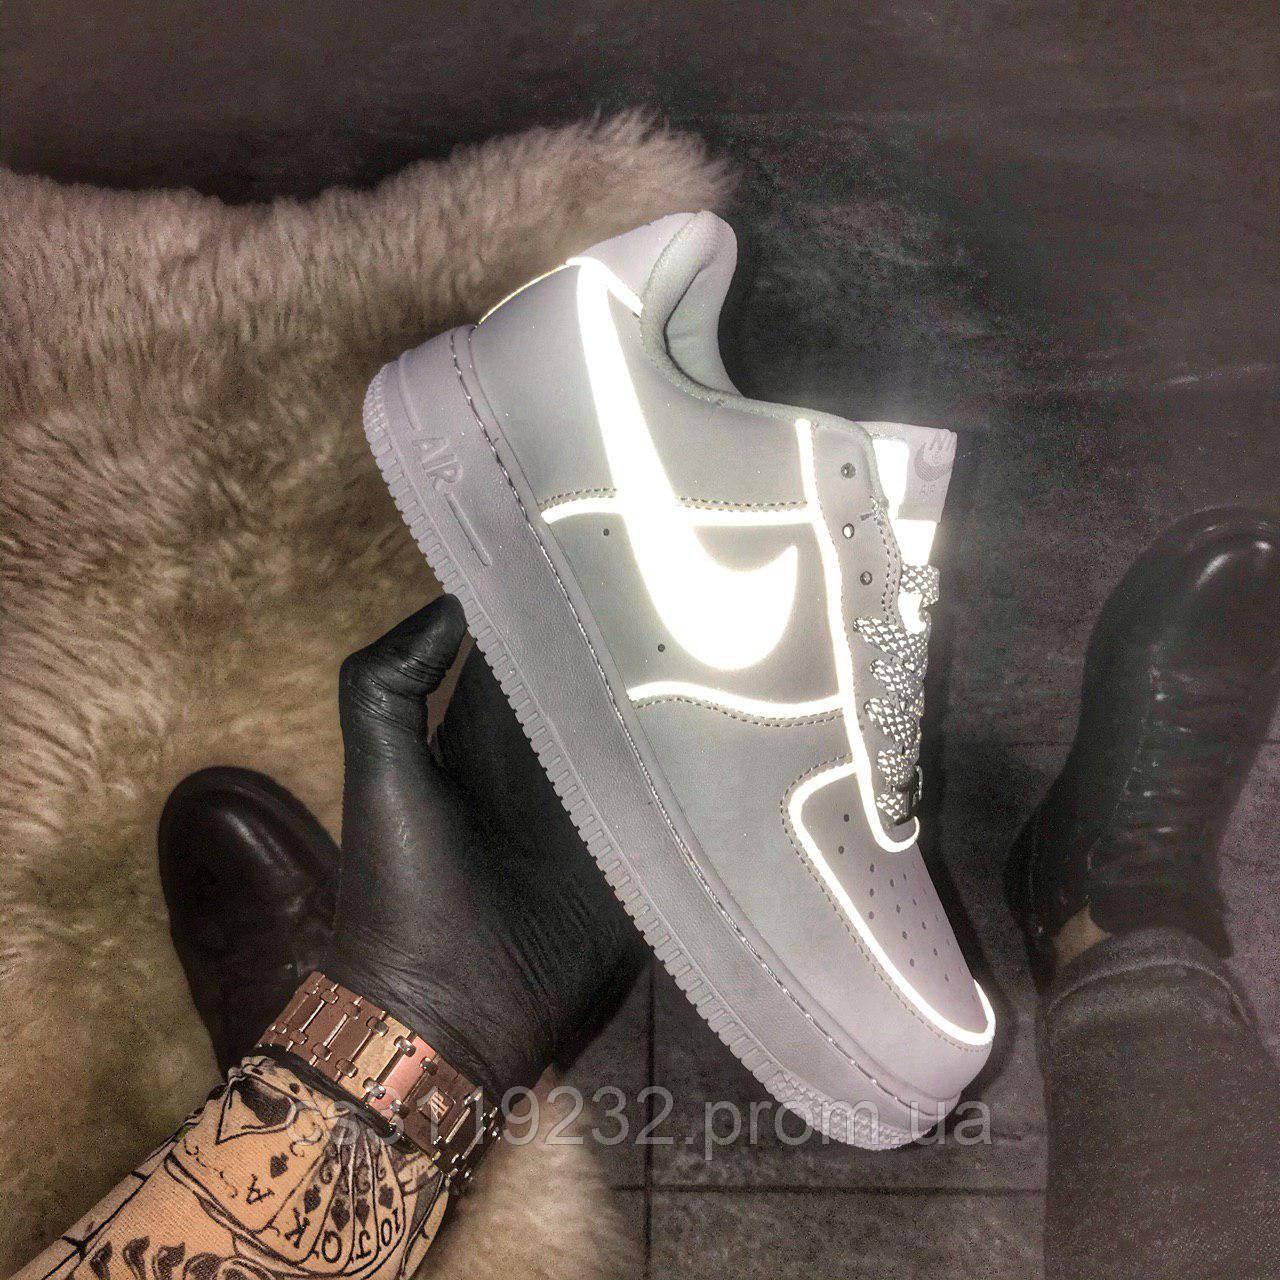 Мужские кроссовки Nike Air Force Low White Grey Reflective (белые)